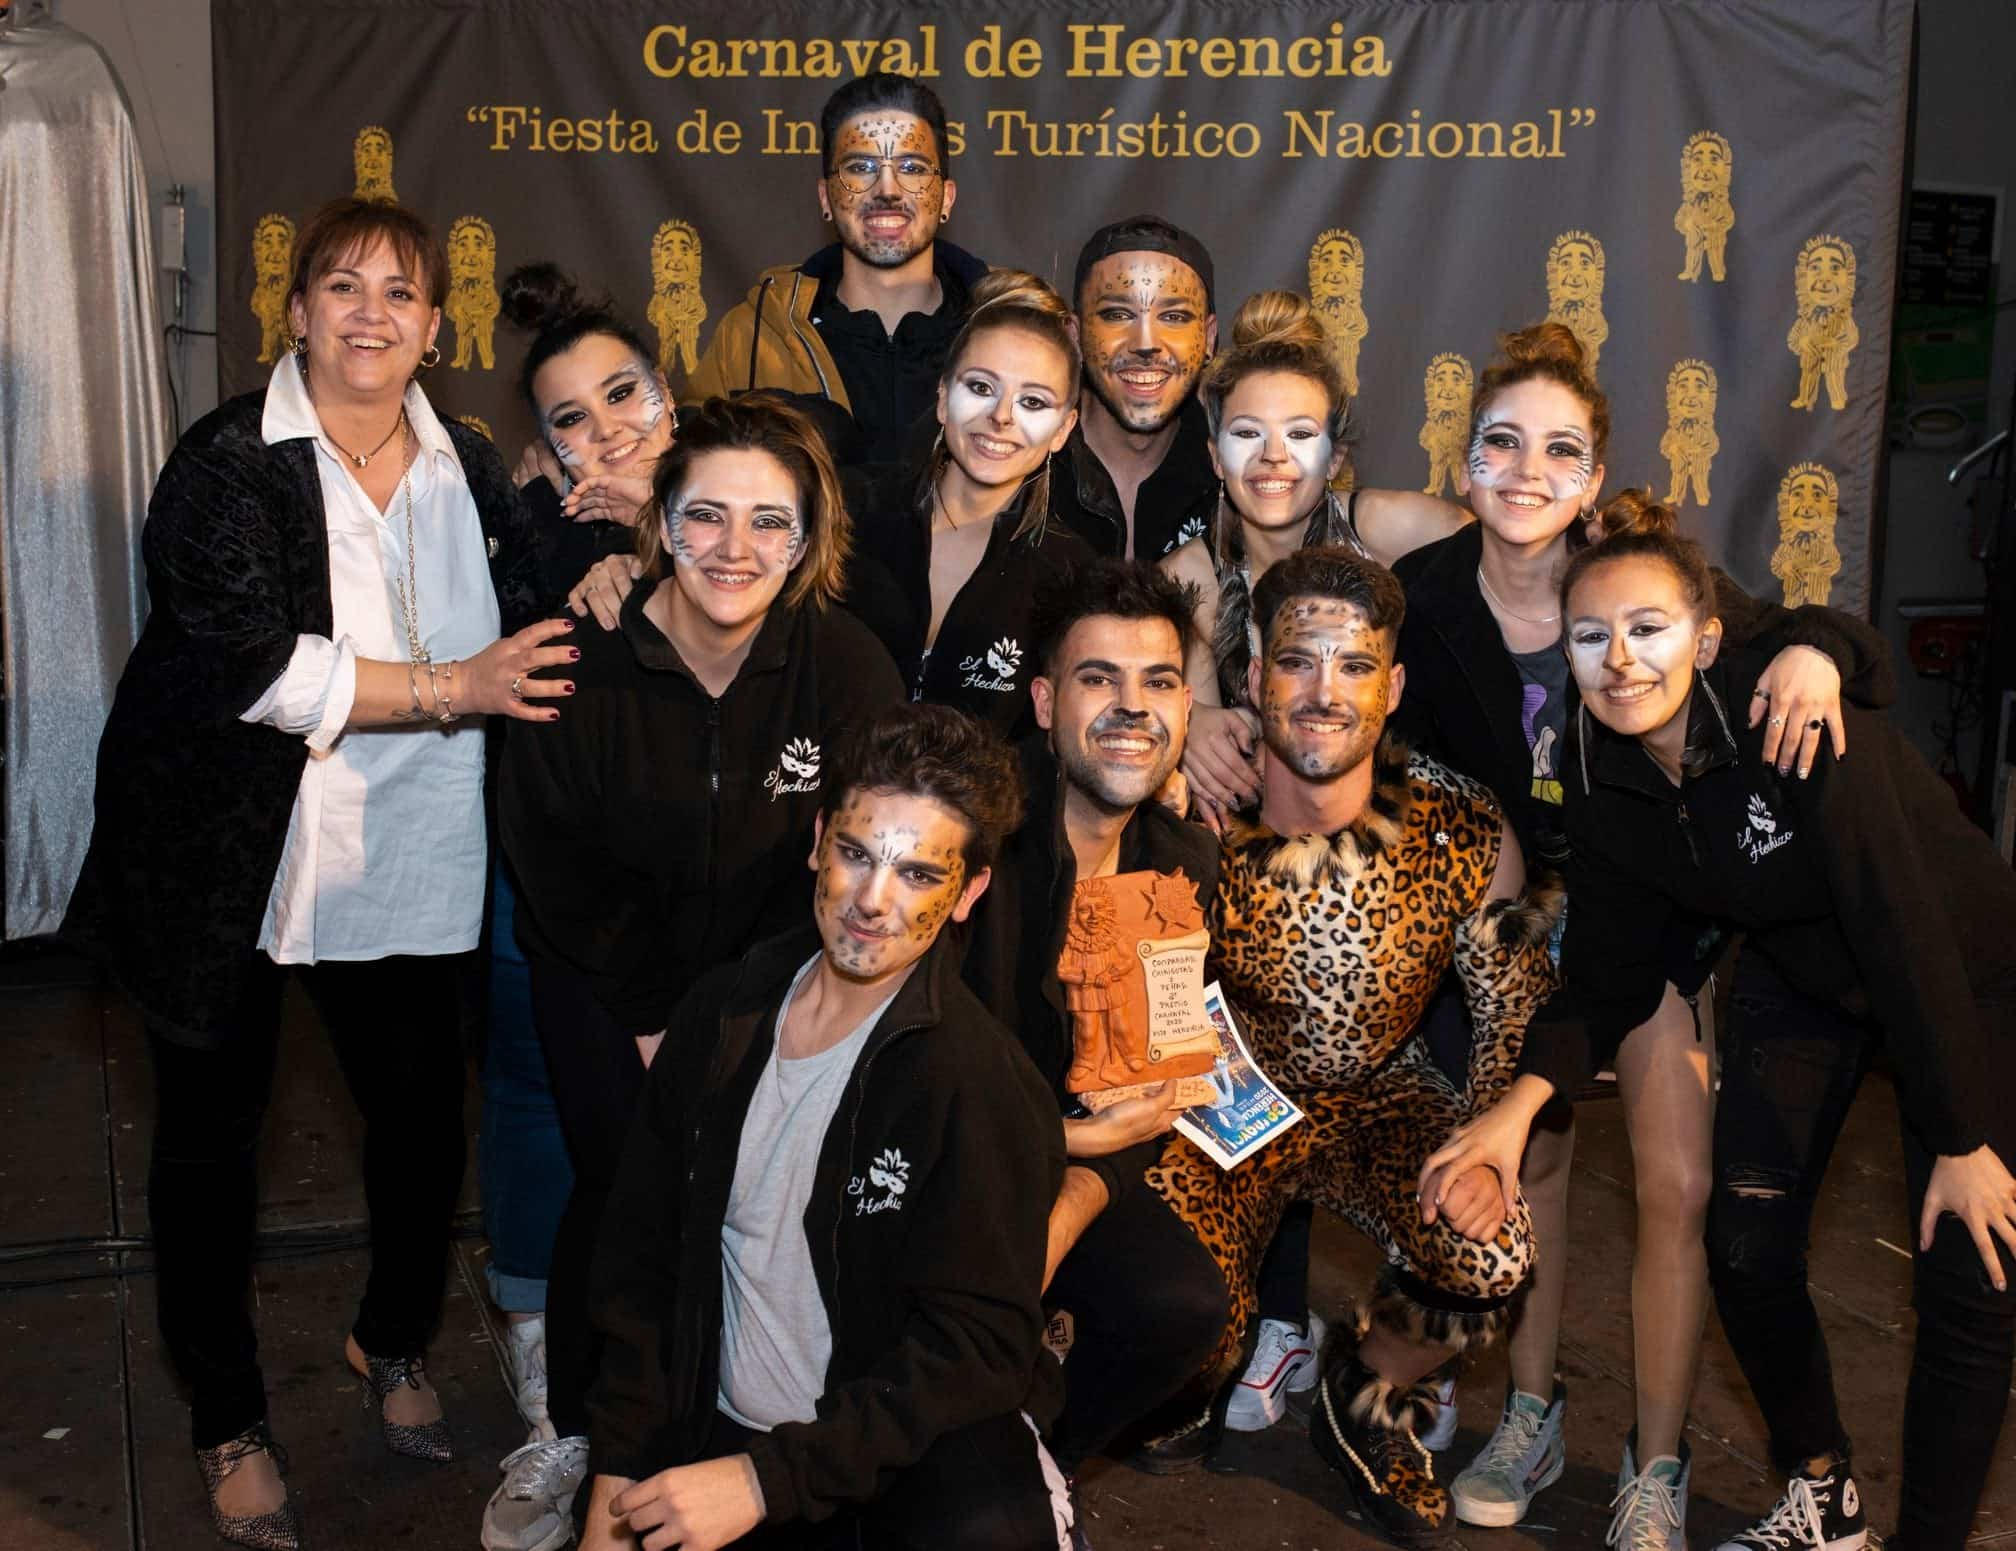 Carnaval de herencia 2020 ofertorio 81 - Selección de fotografías del Ofertorio del Carnaval de Herencia